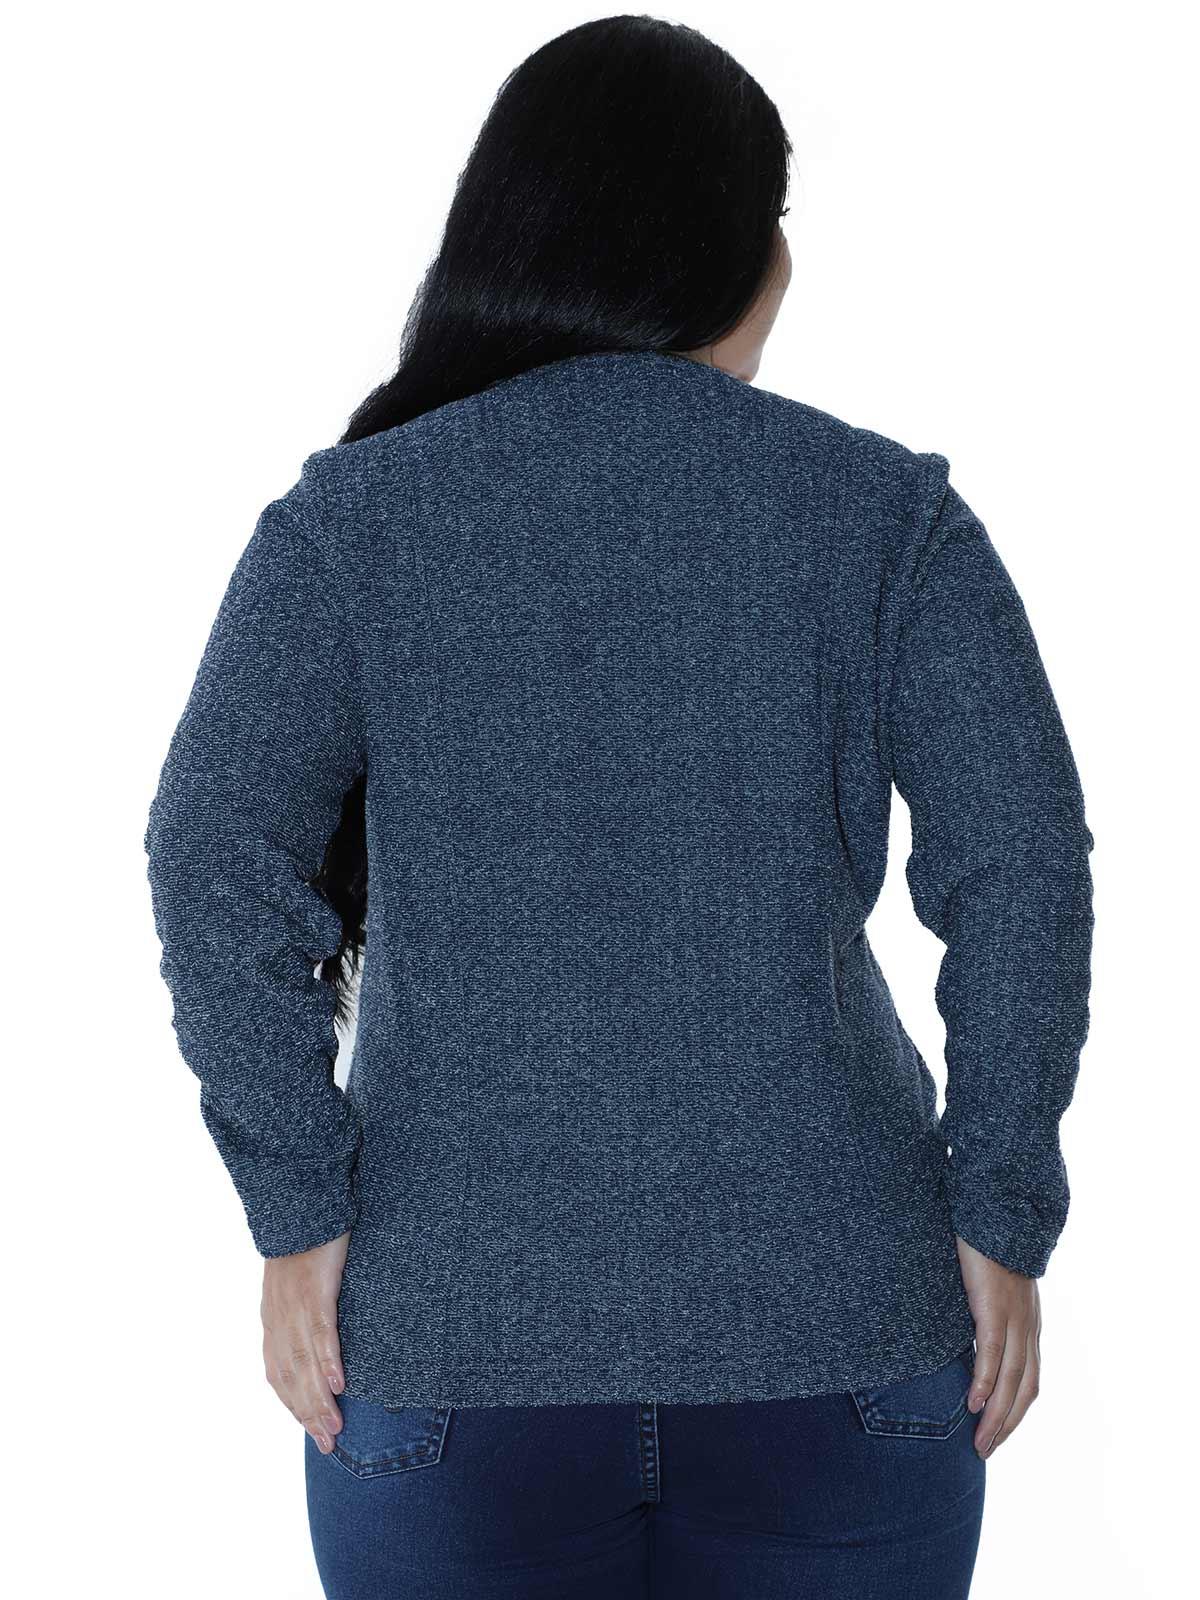 Casaco Plus Size Aberto Malha Tweed Azul Marinho